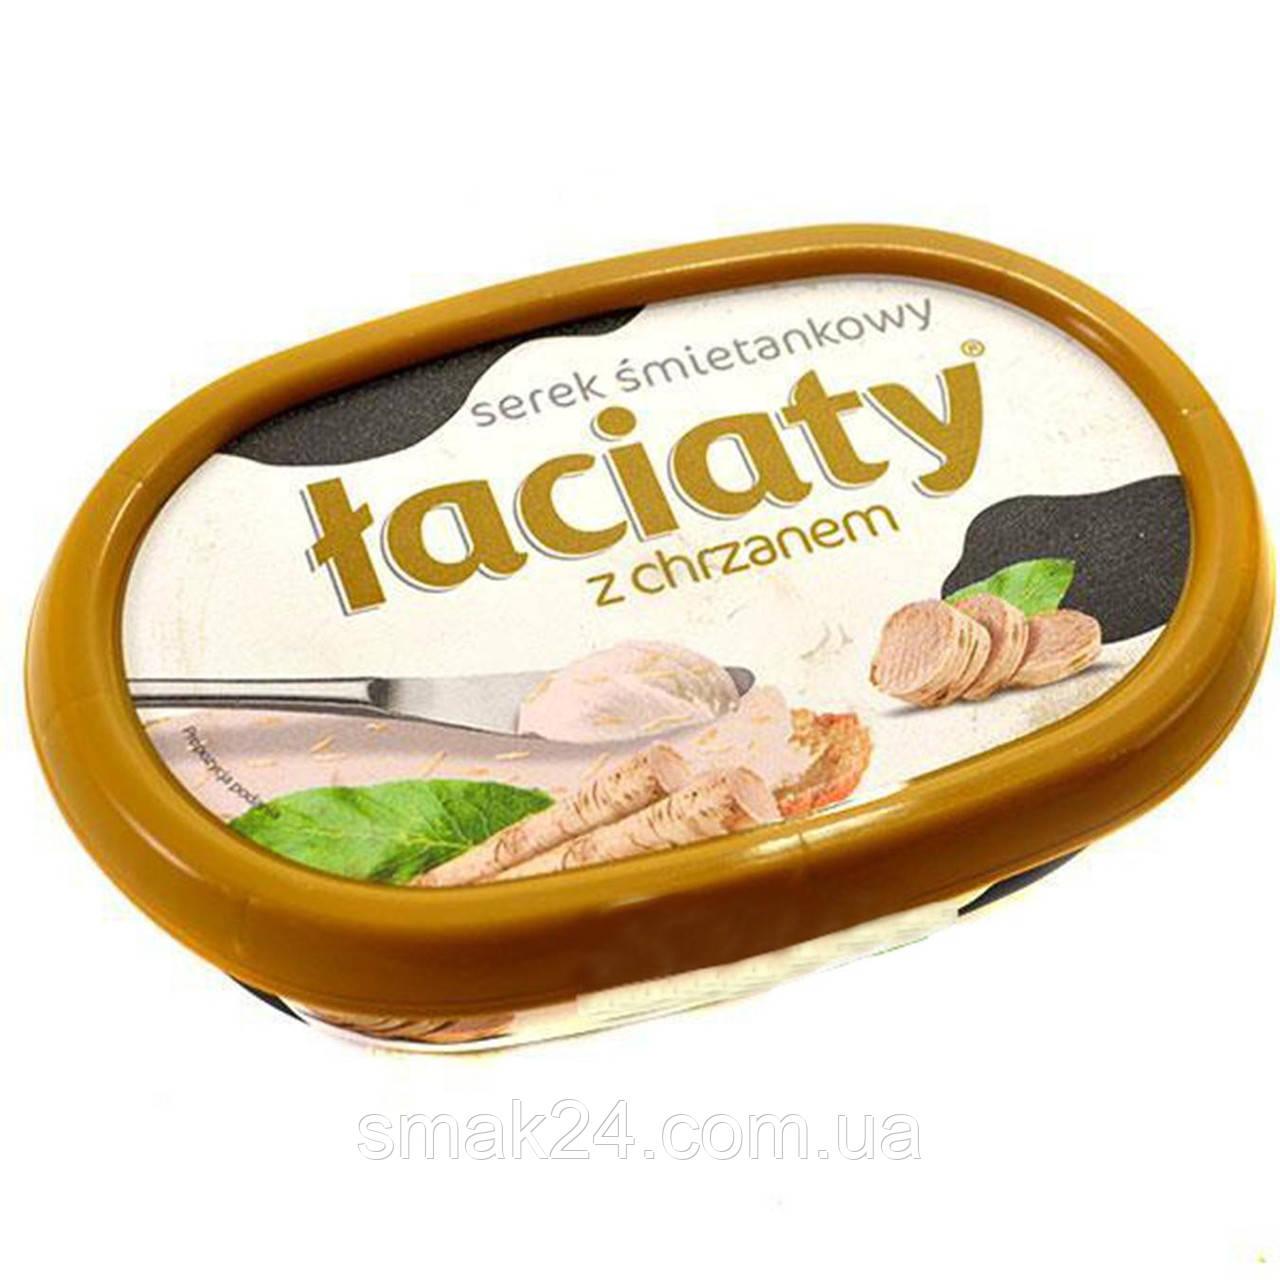 Сыр-крем (сырная намазка) Laciaty с хреном Польша 135г